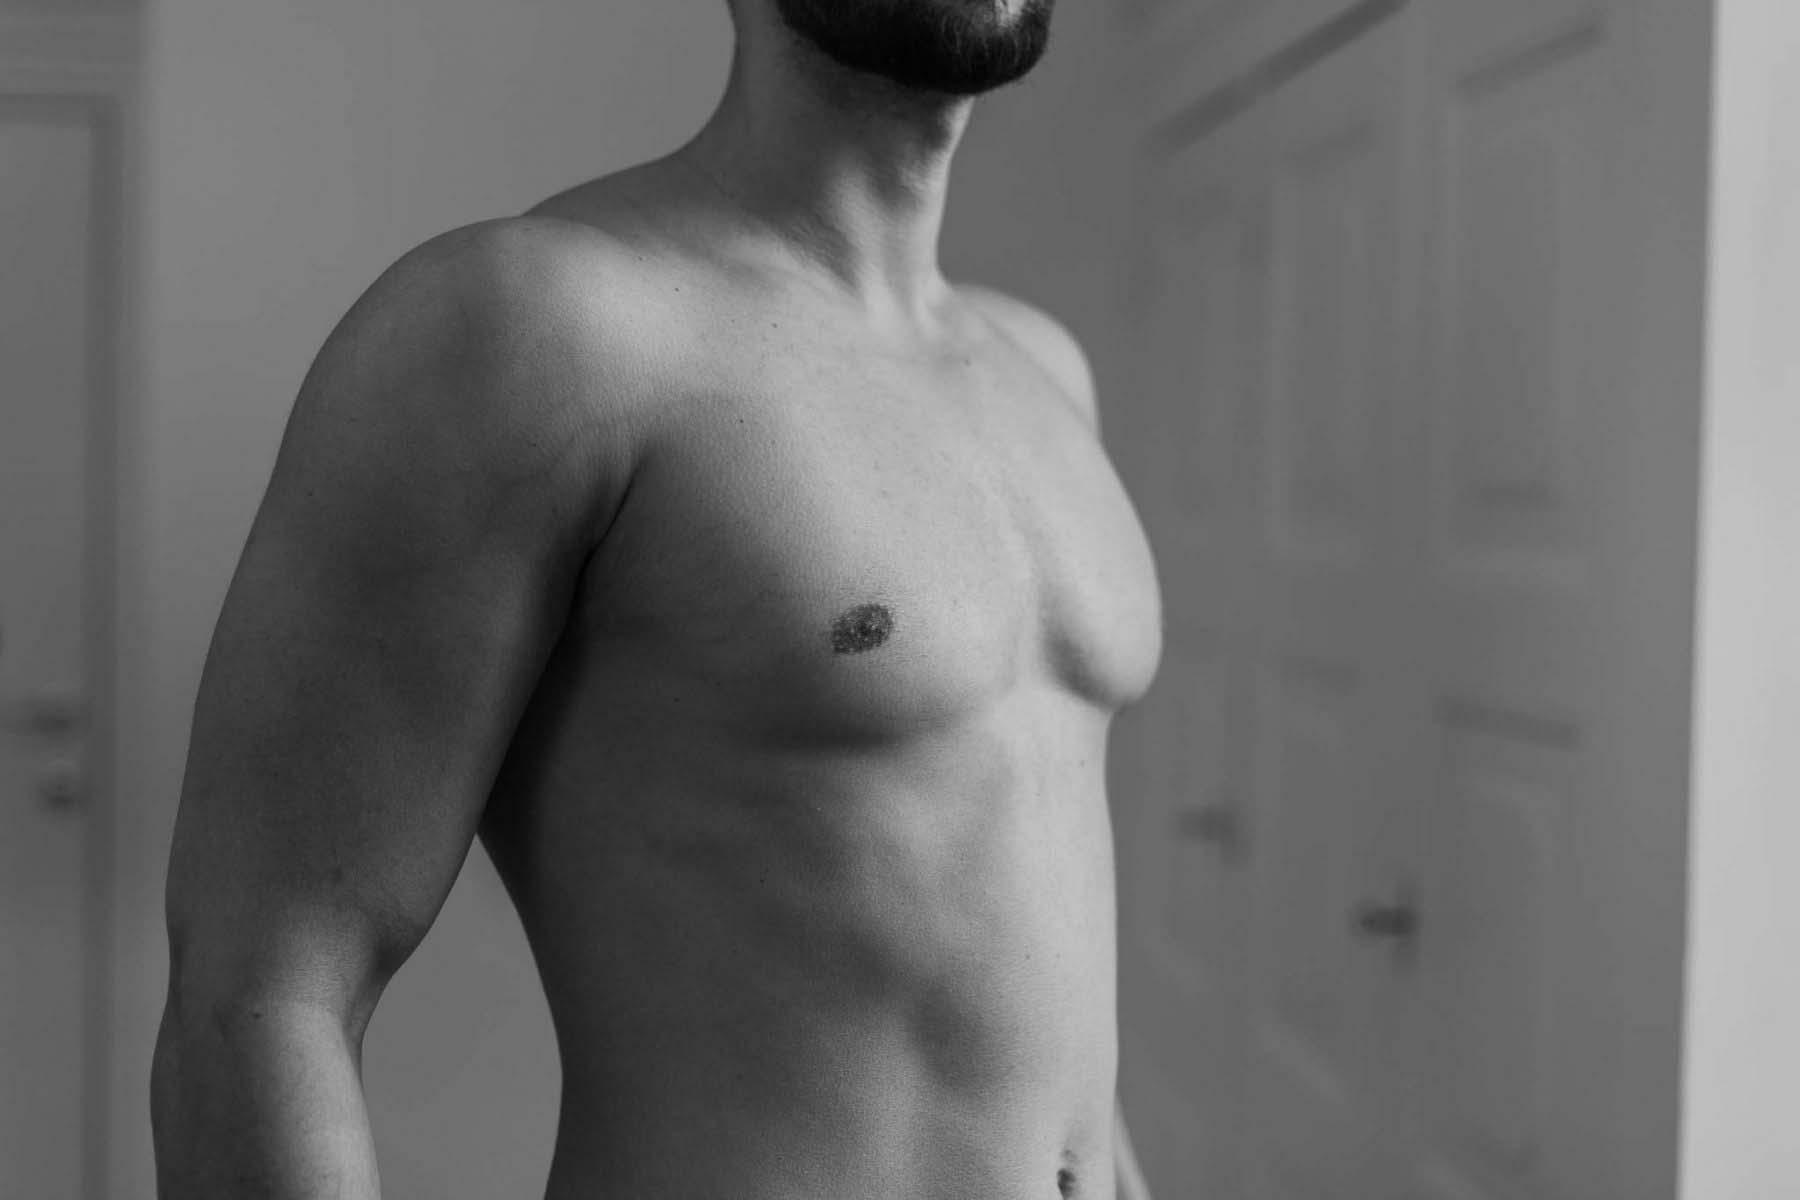 Fettabsaugung, Liposuktion